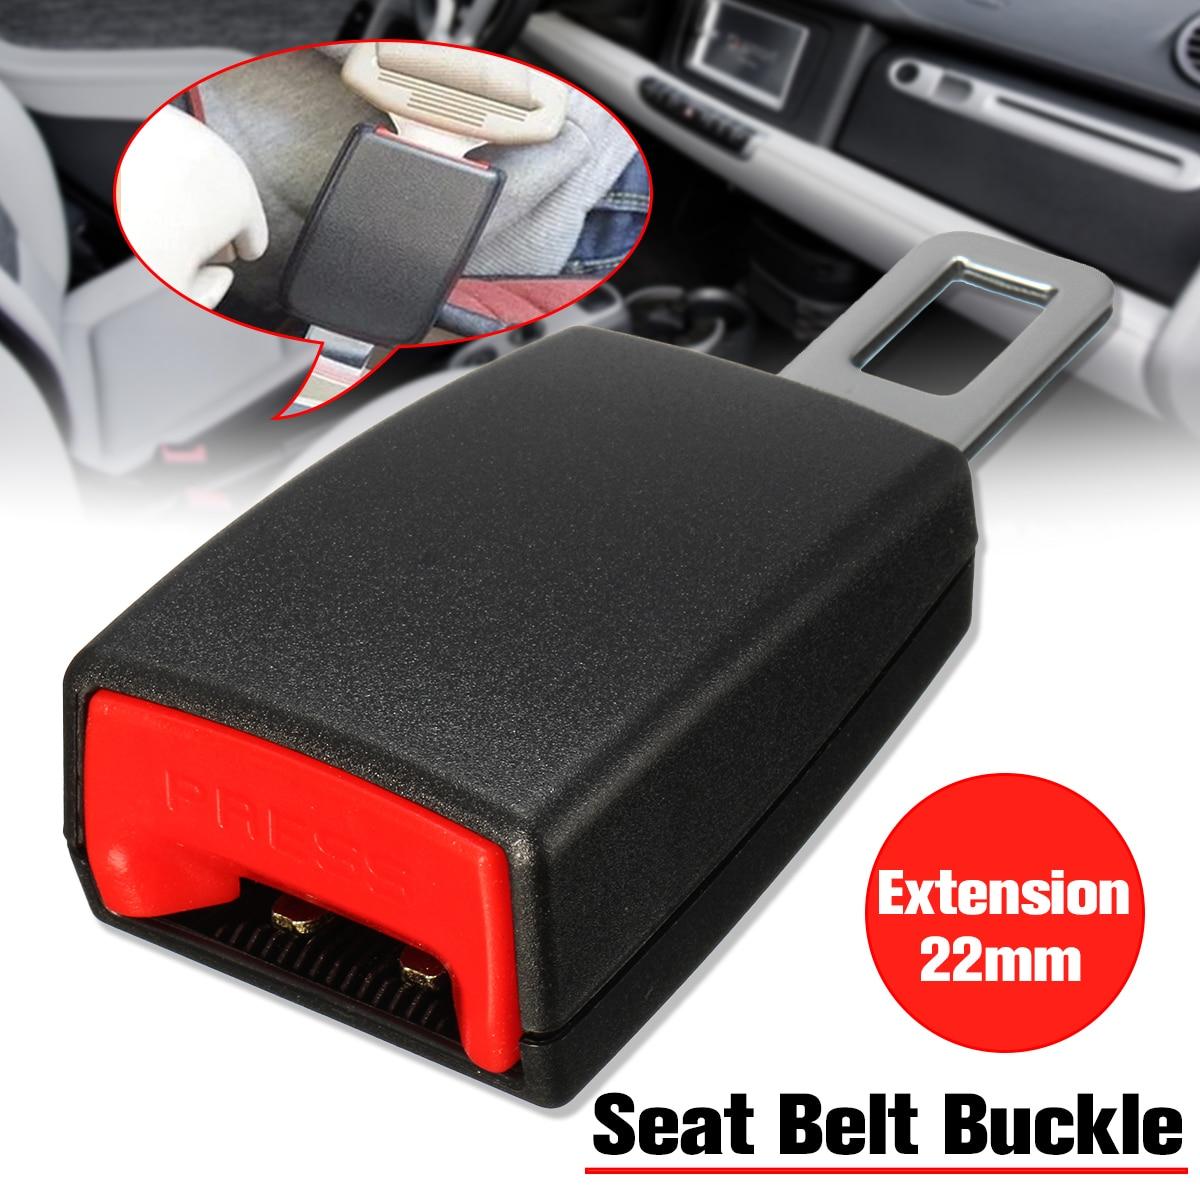 Universal clip para cinturón de seguridad de coche extensor para skoda vw t5 mercedes w204 amg opel insignia kia picanto passat b6 vw polo 6r volvo s60